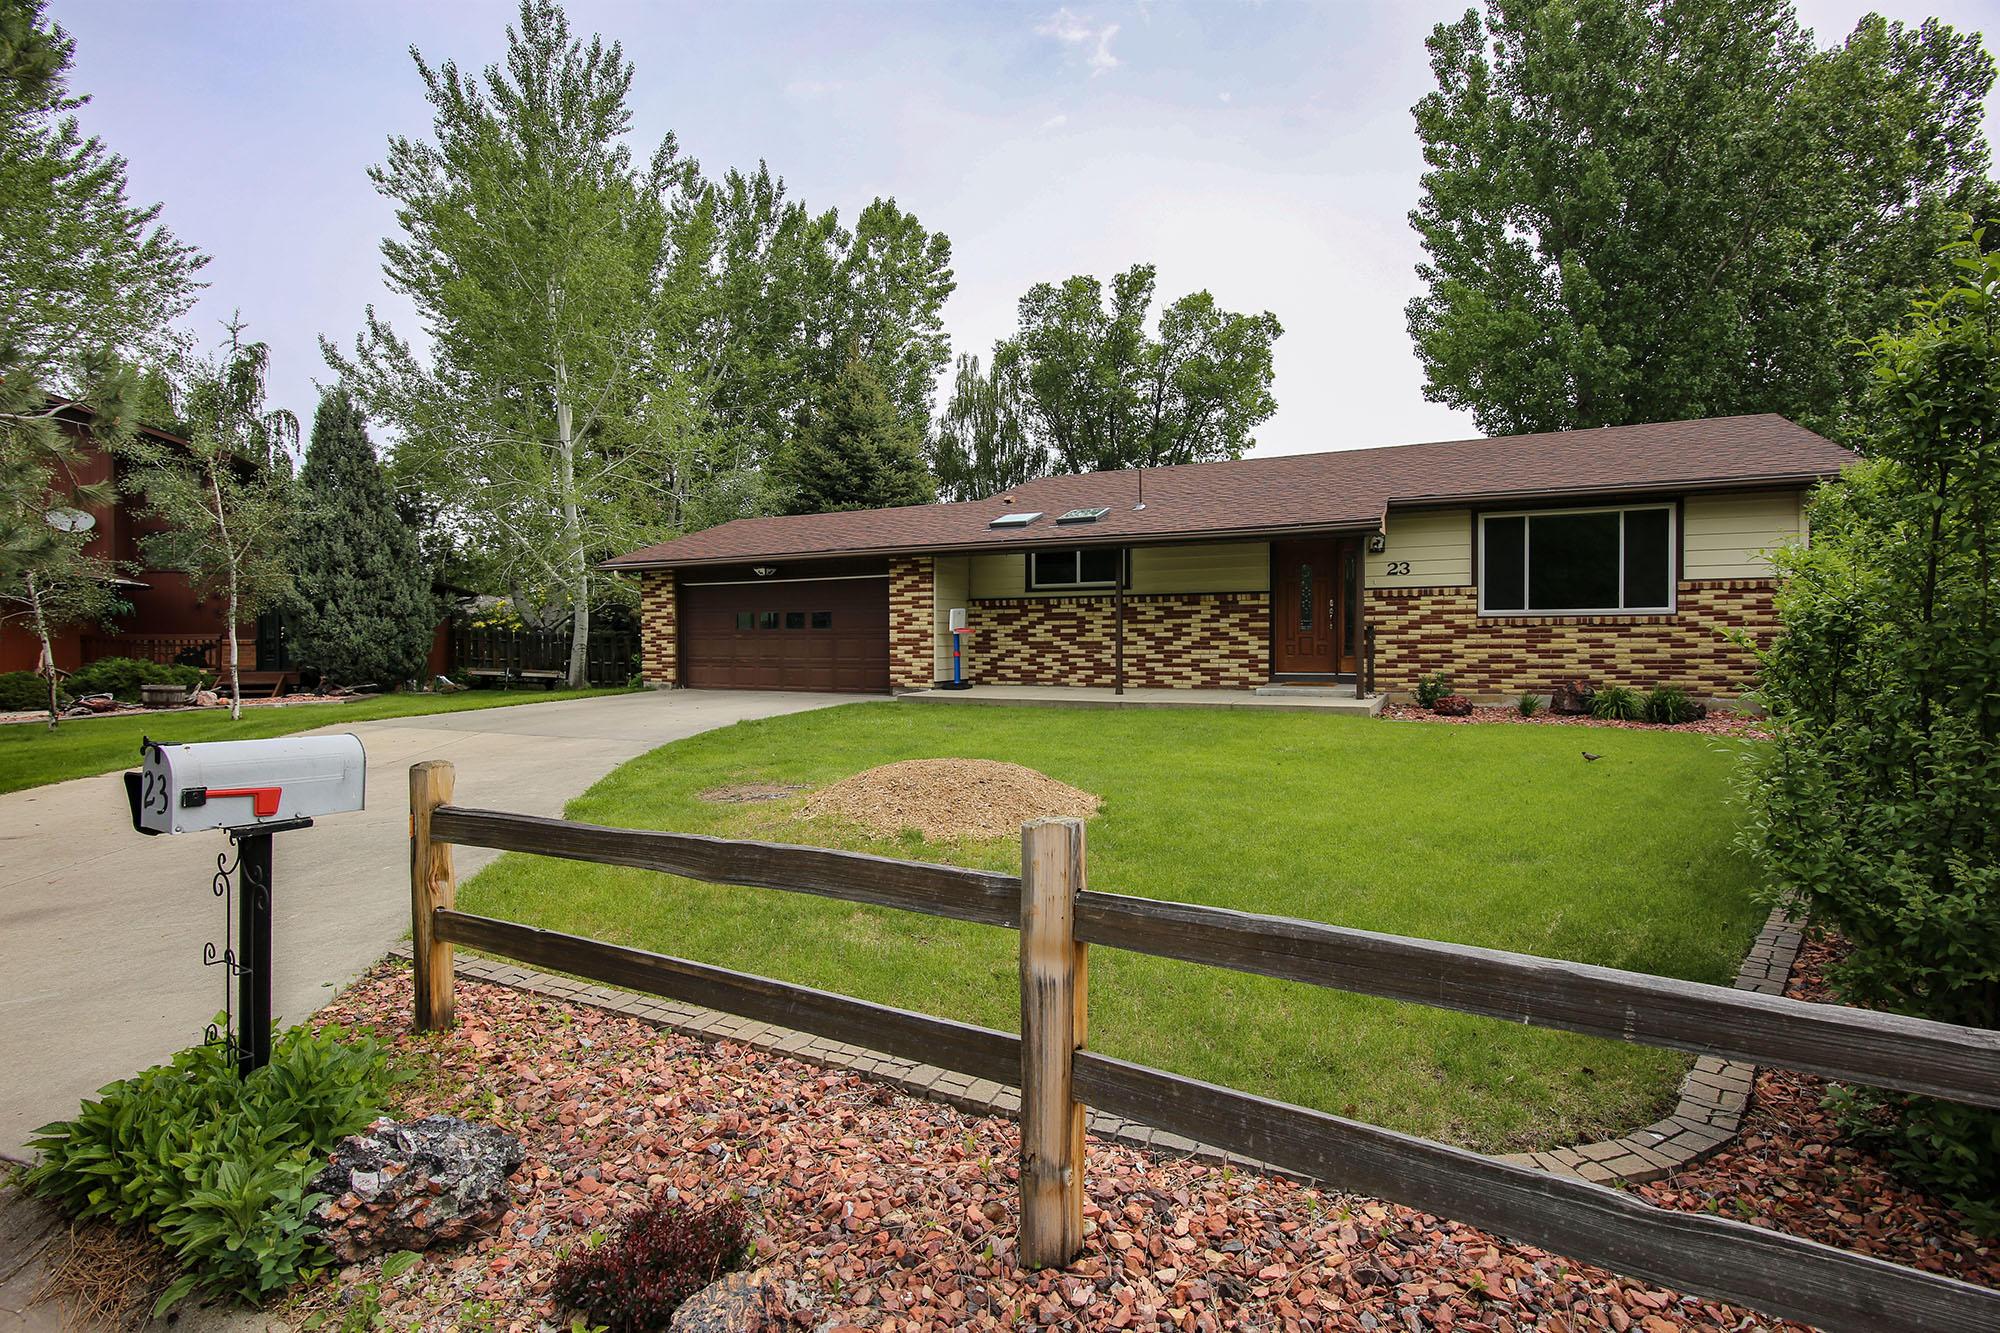 23 Davis Tee, Sheridan, Wyoming 82801, 4 Bedrooms Bedrooms, ,2 BathroomsBathrooms,Residential,For Sale,Davis Tee,19-570